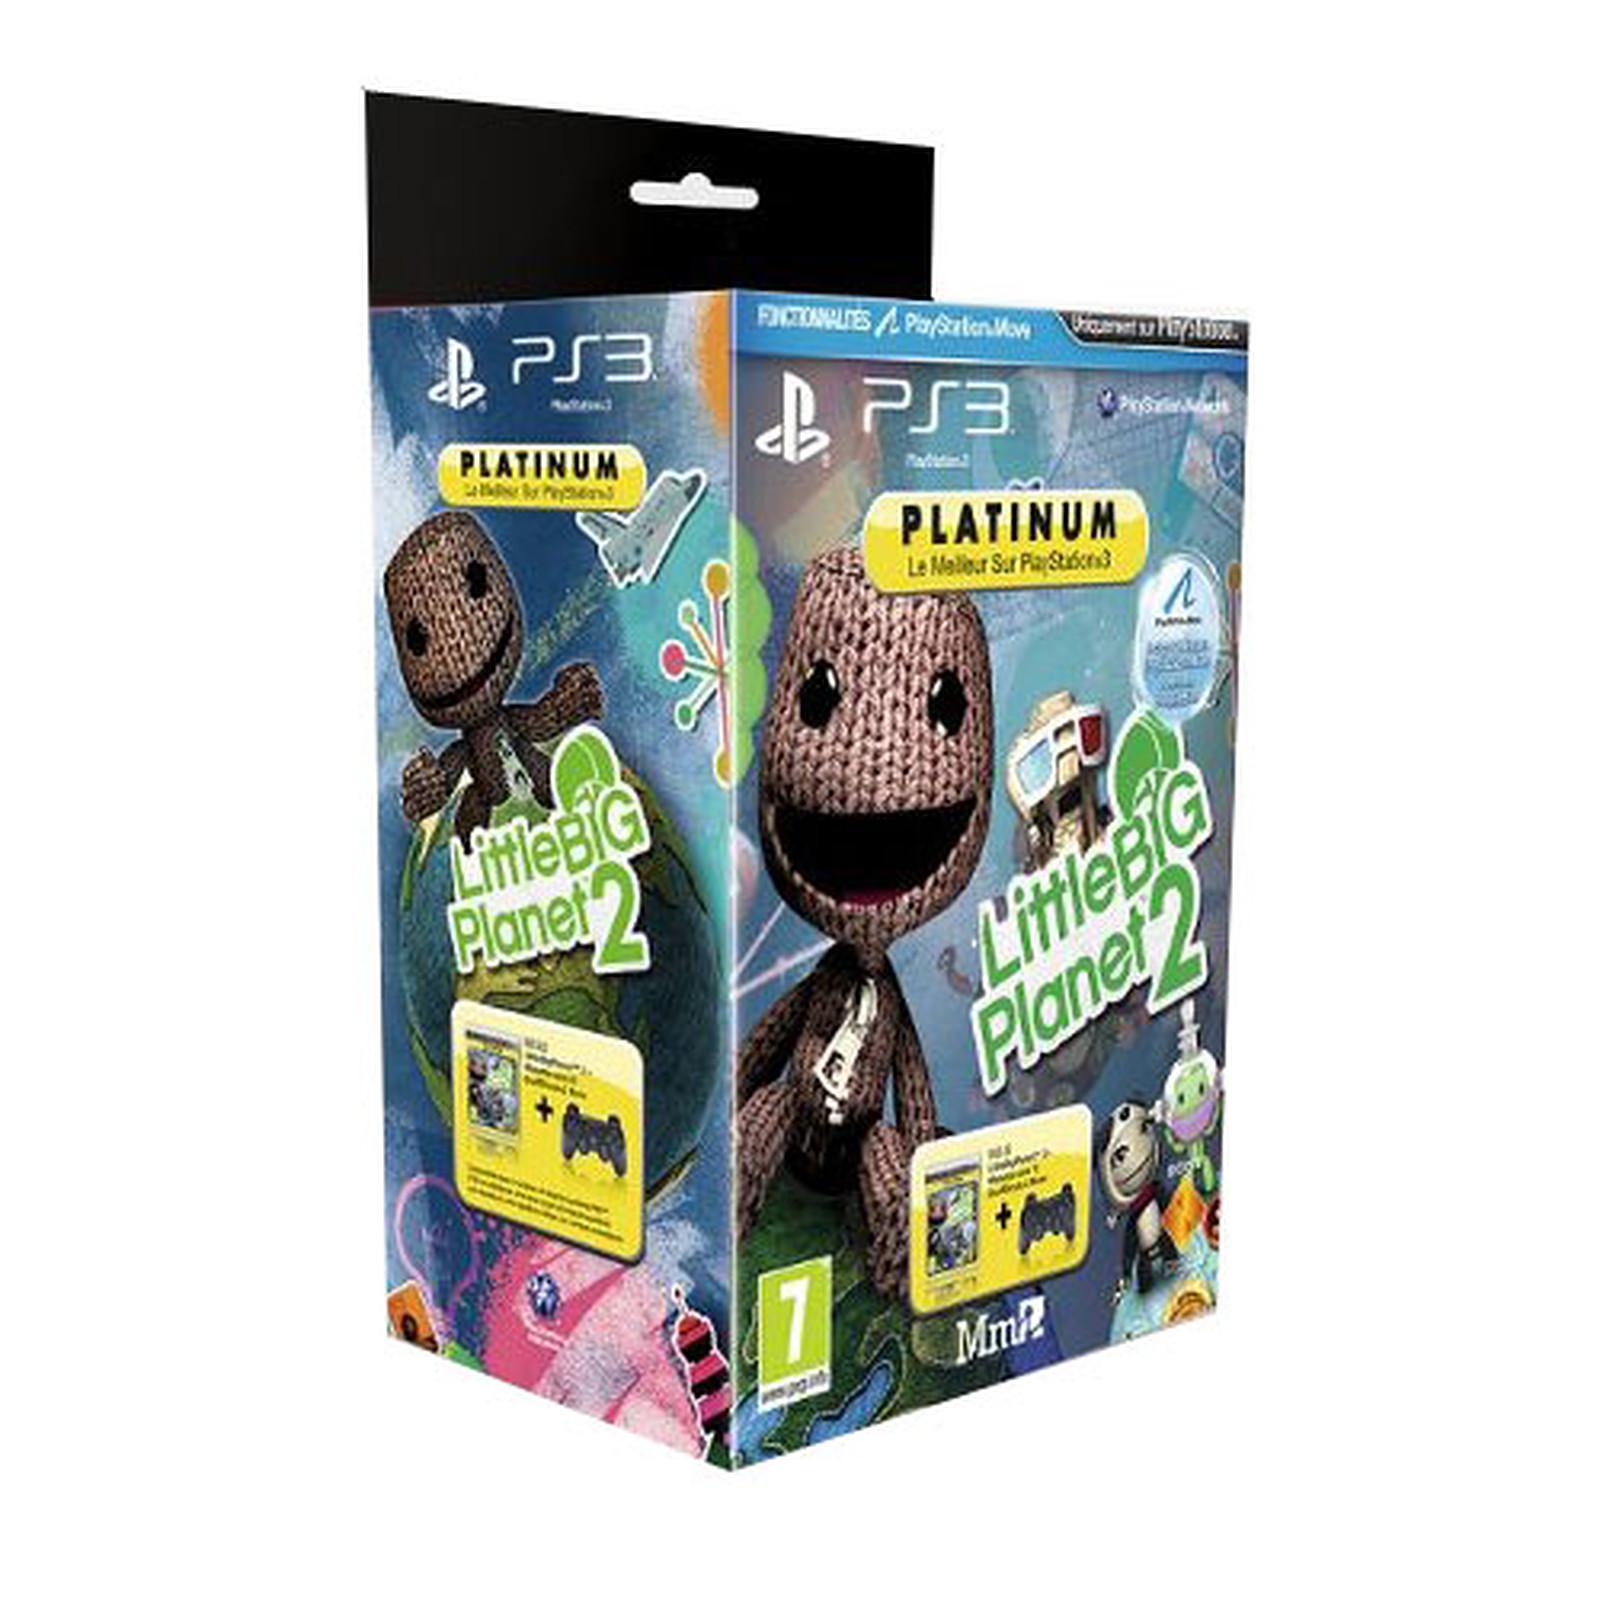 Sony DualShock 3 + Little Big Planet 2 - Platinum (PS3)